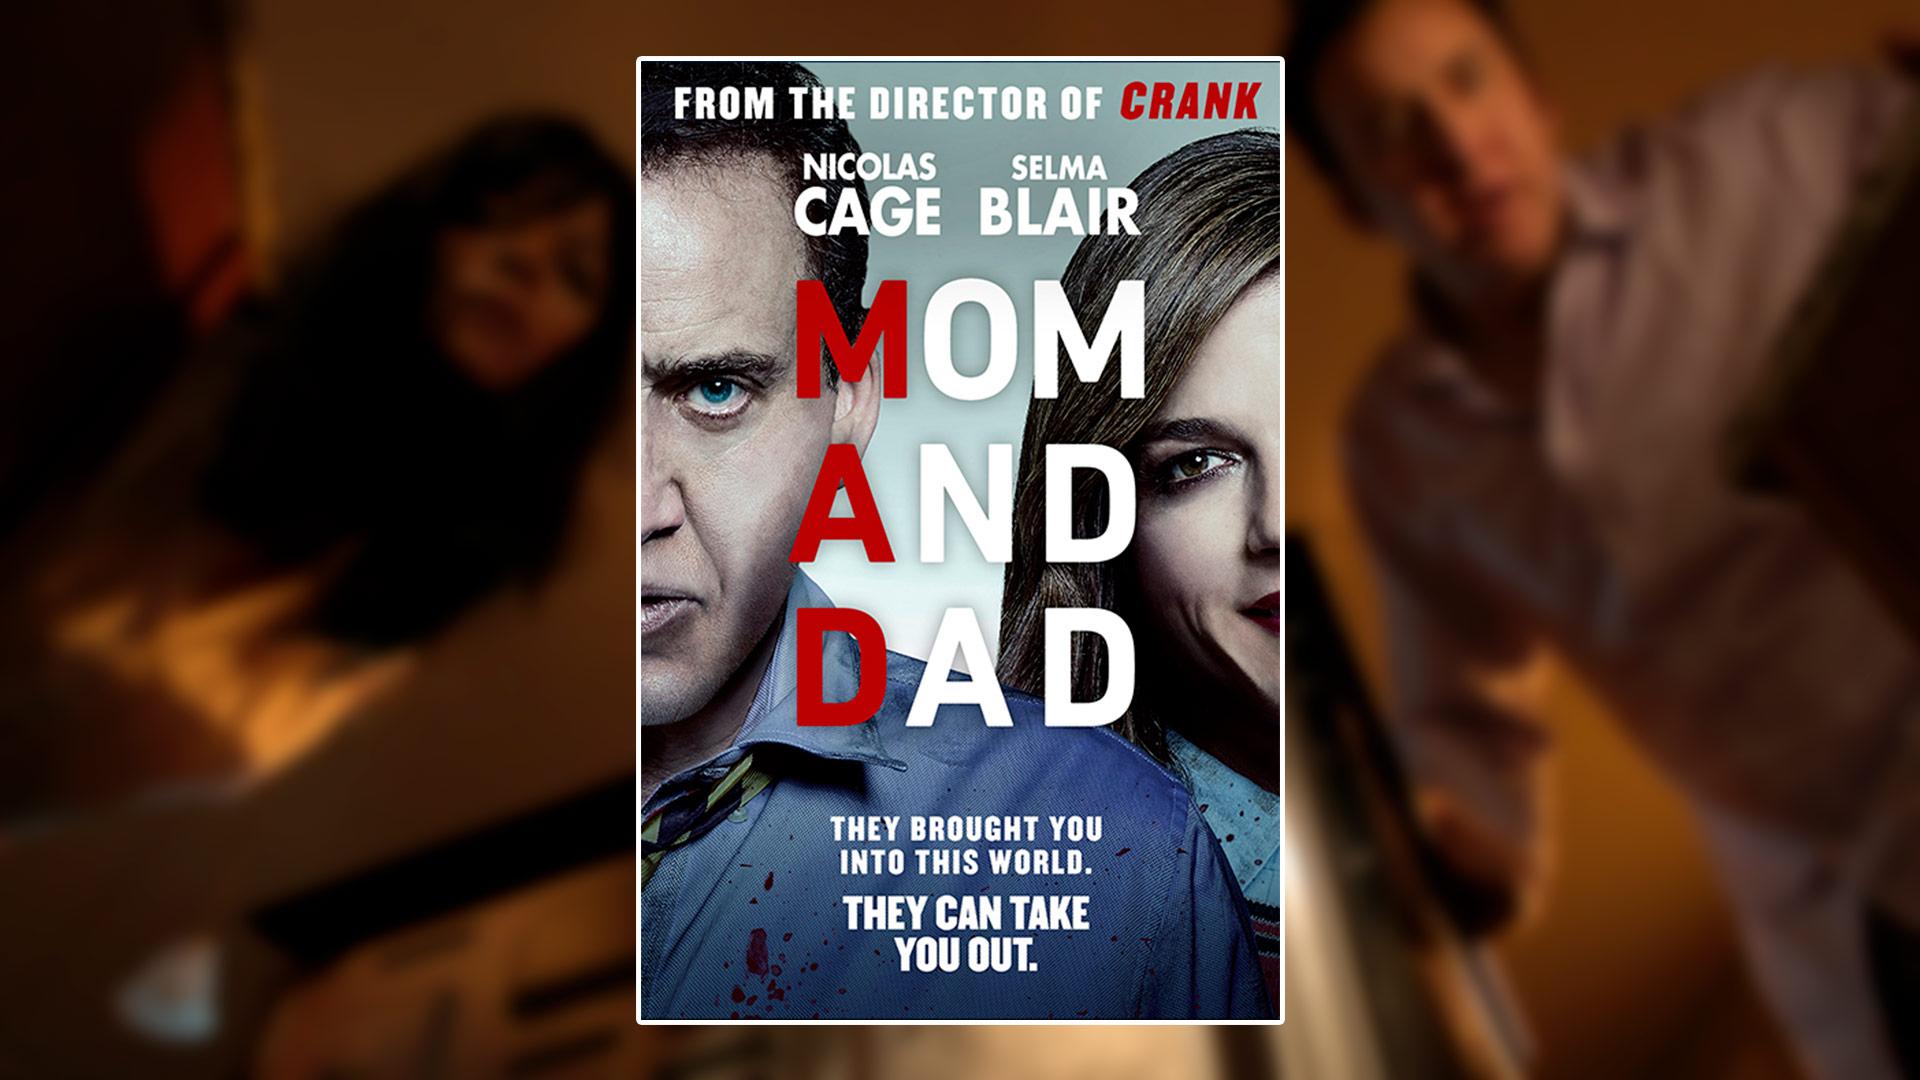 Critique du film Mom and Dad avec Nicolas Cage